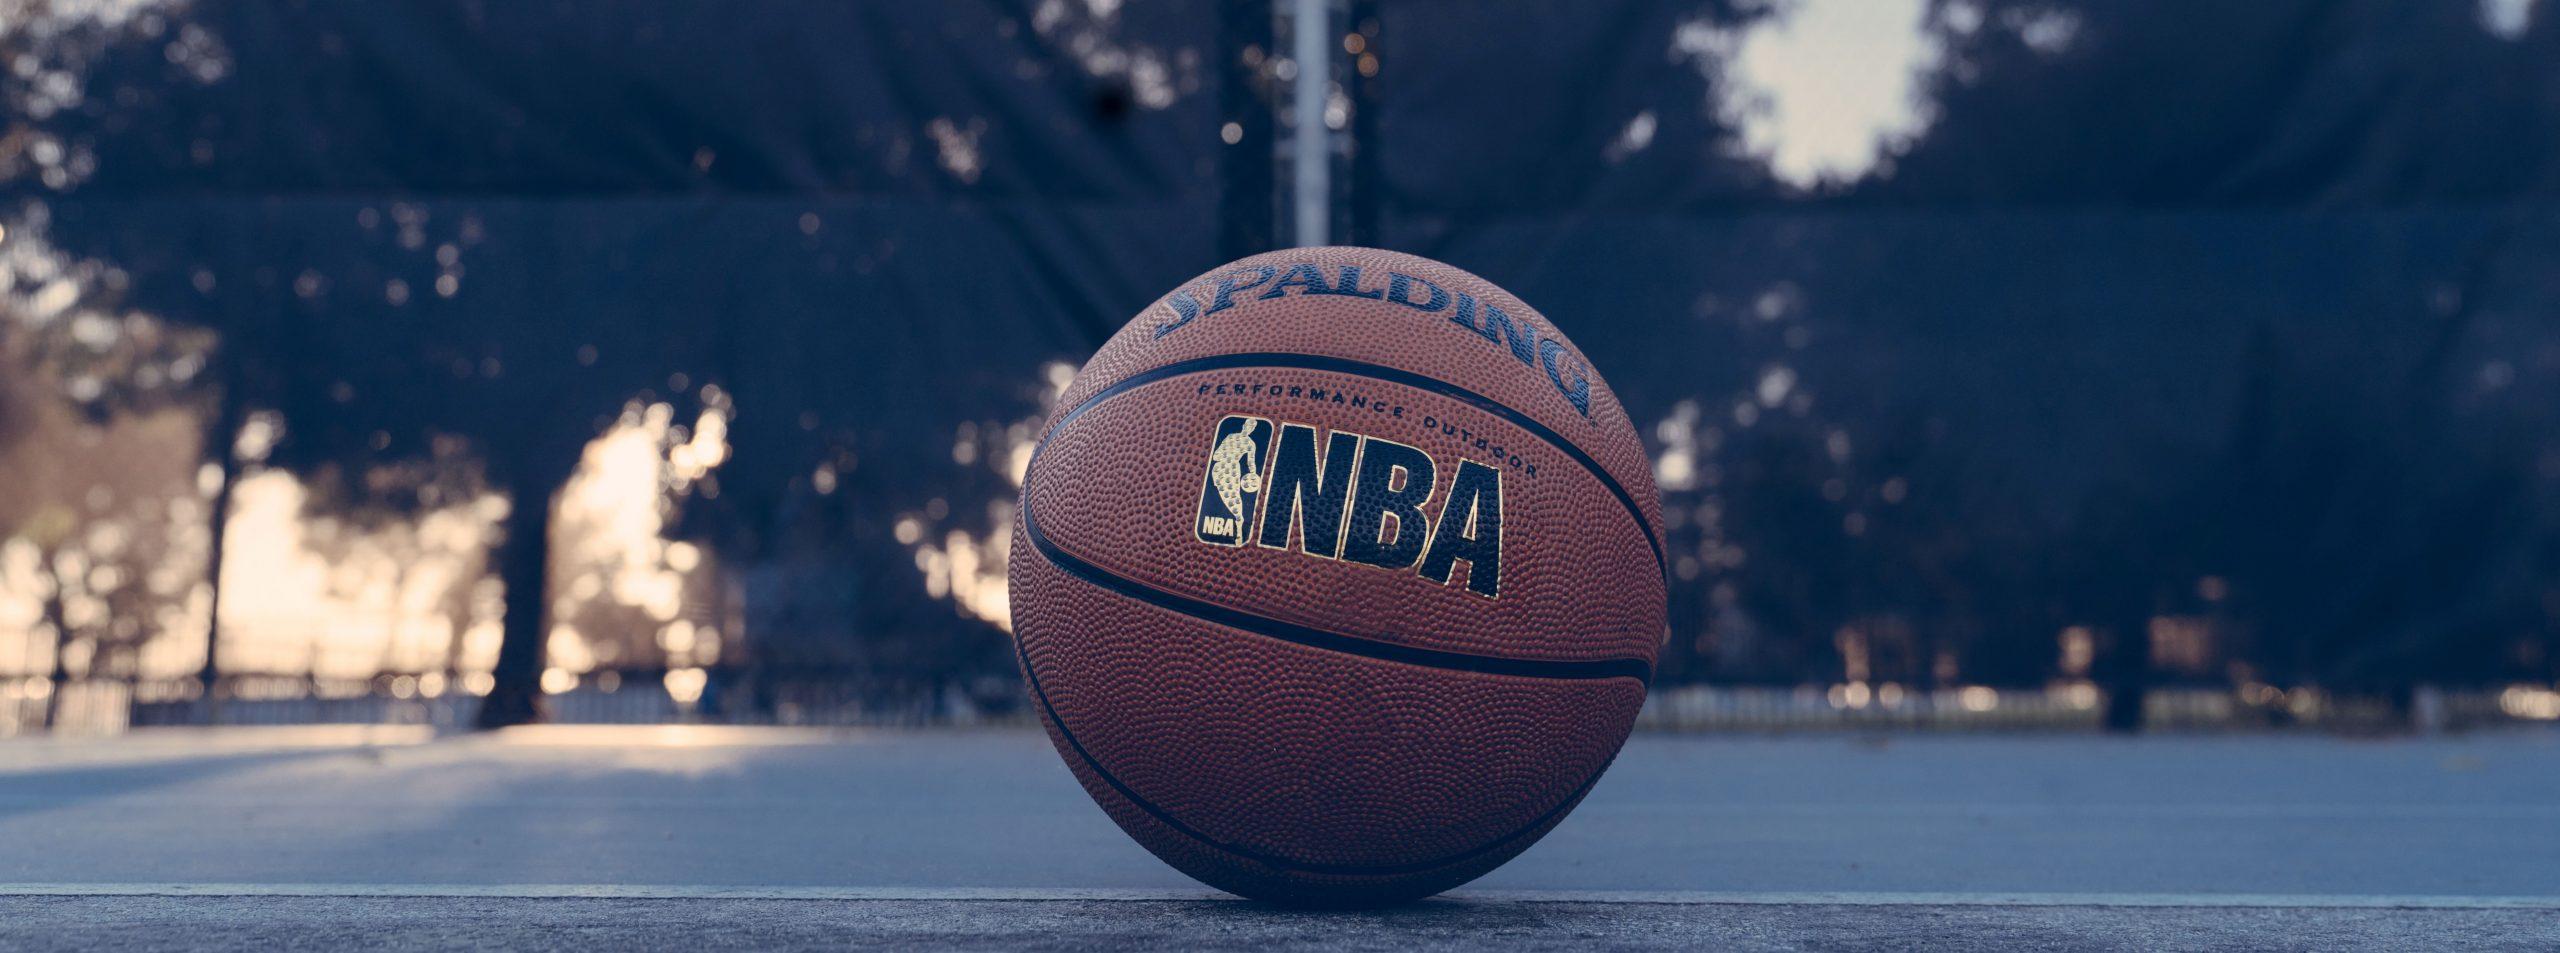 "NBA Spieler meint, er hätte das Coronavirus ""ernster"" nehmen sollen."